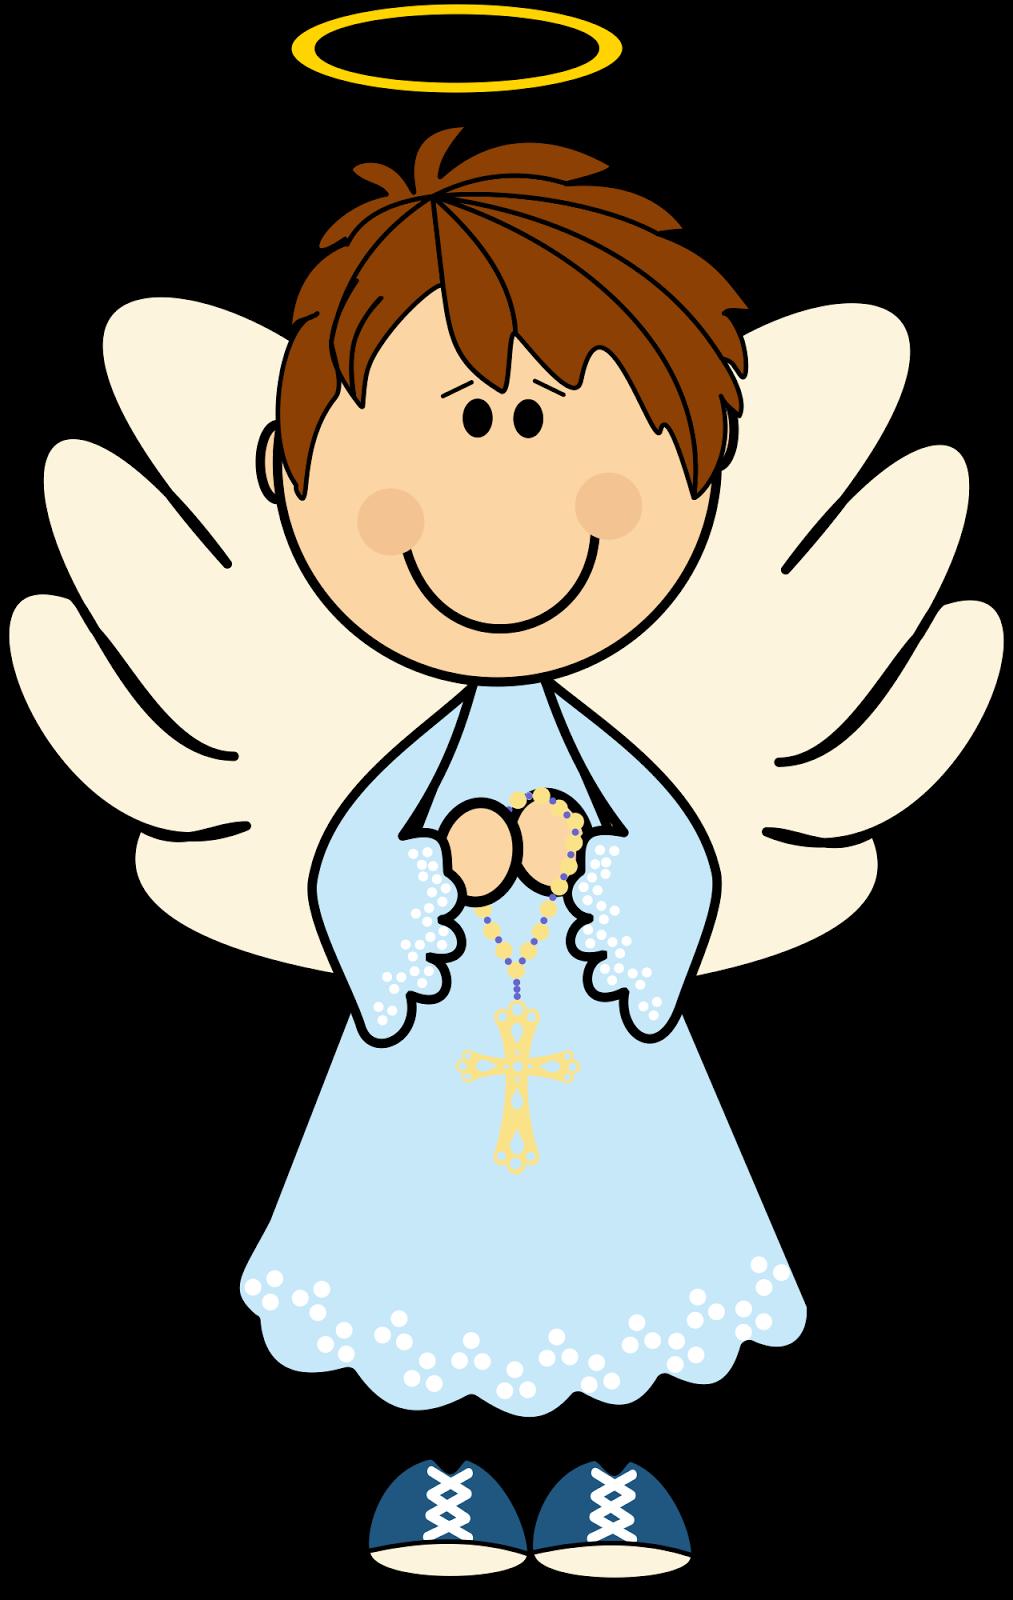 Communion clipart remember me. Help festas e personalizados